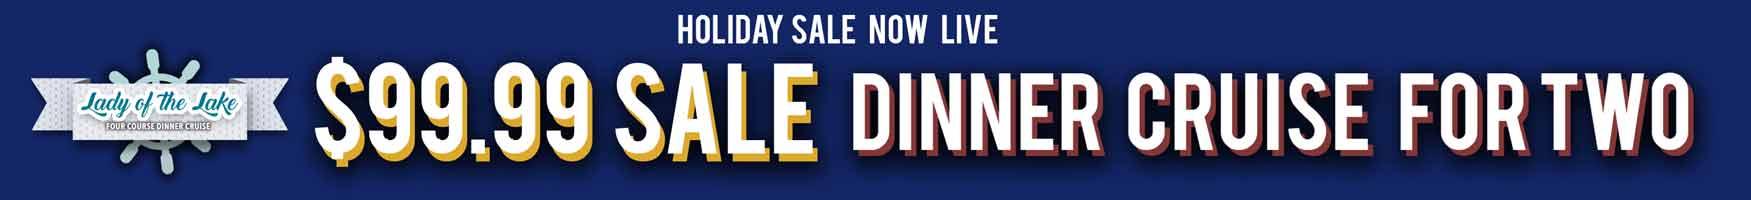 HUGE SAVINGS ON LAKE NORMAN DINNER CRUISES!